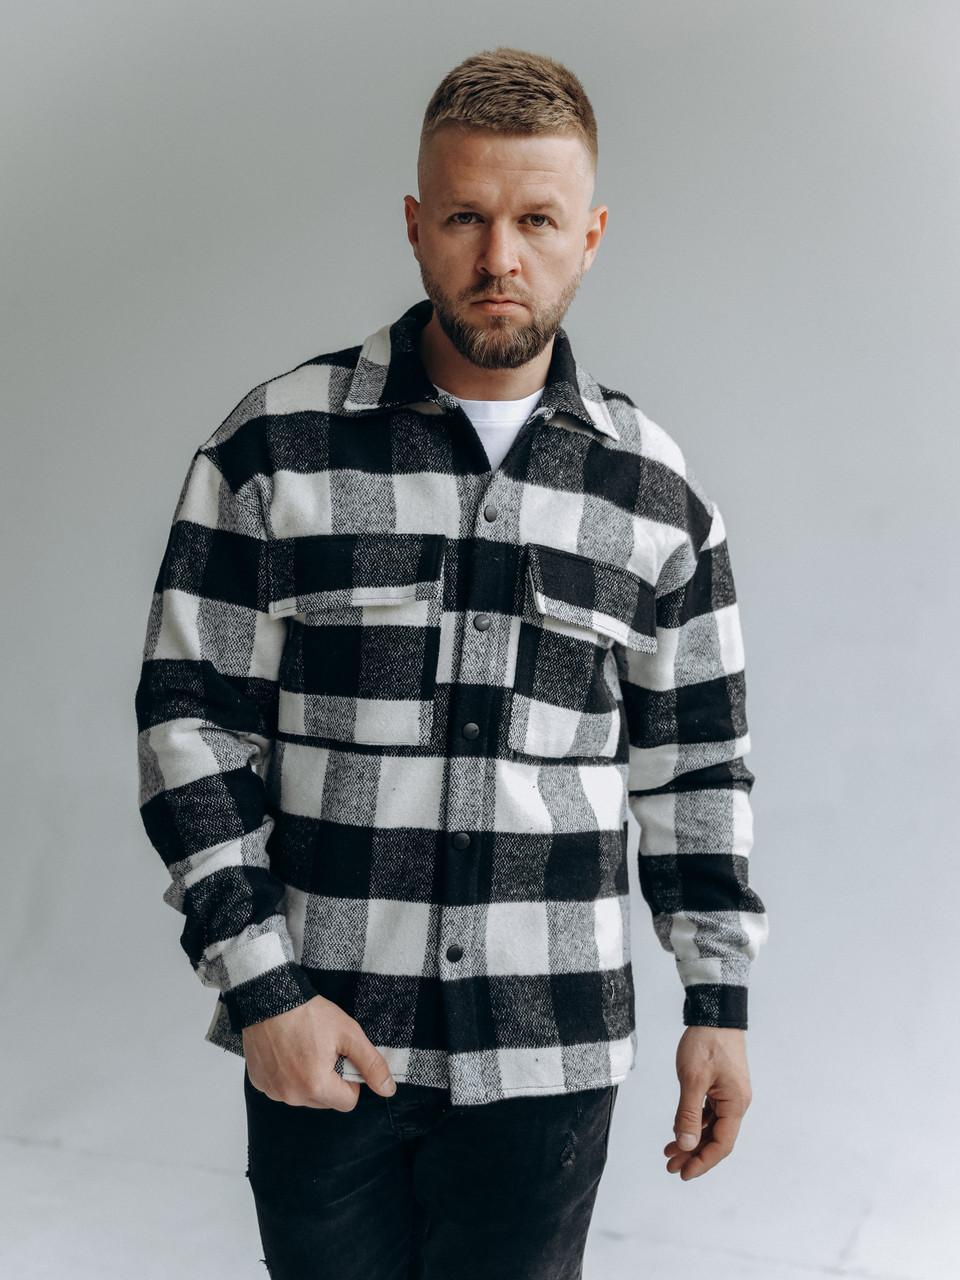 Картата чоловіча куртка-сорочка, фото 3